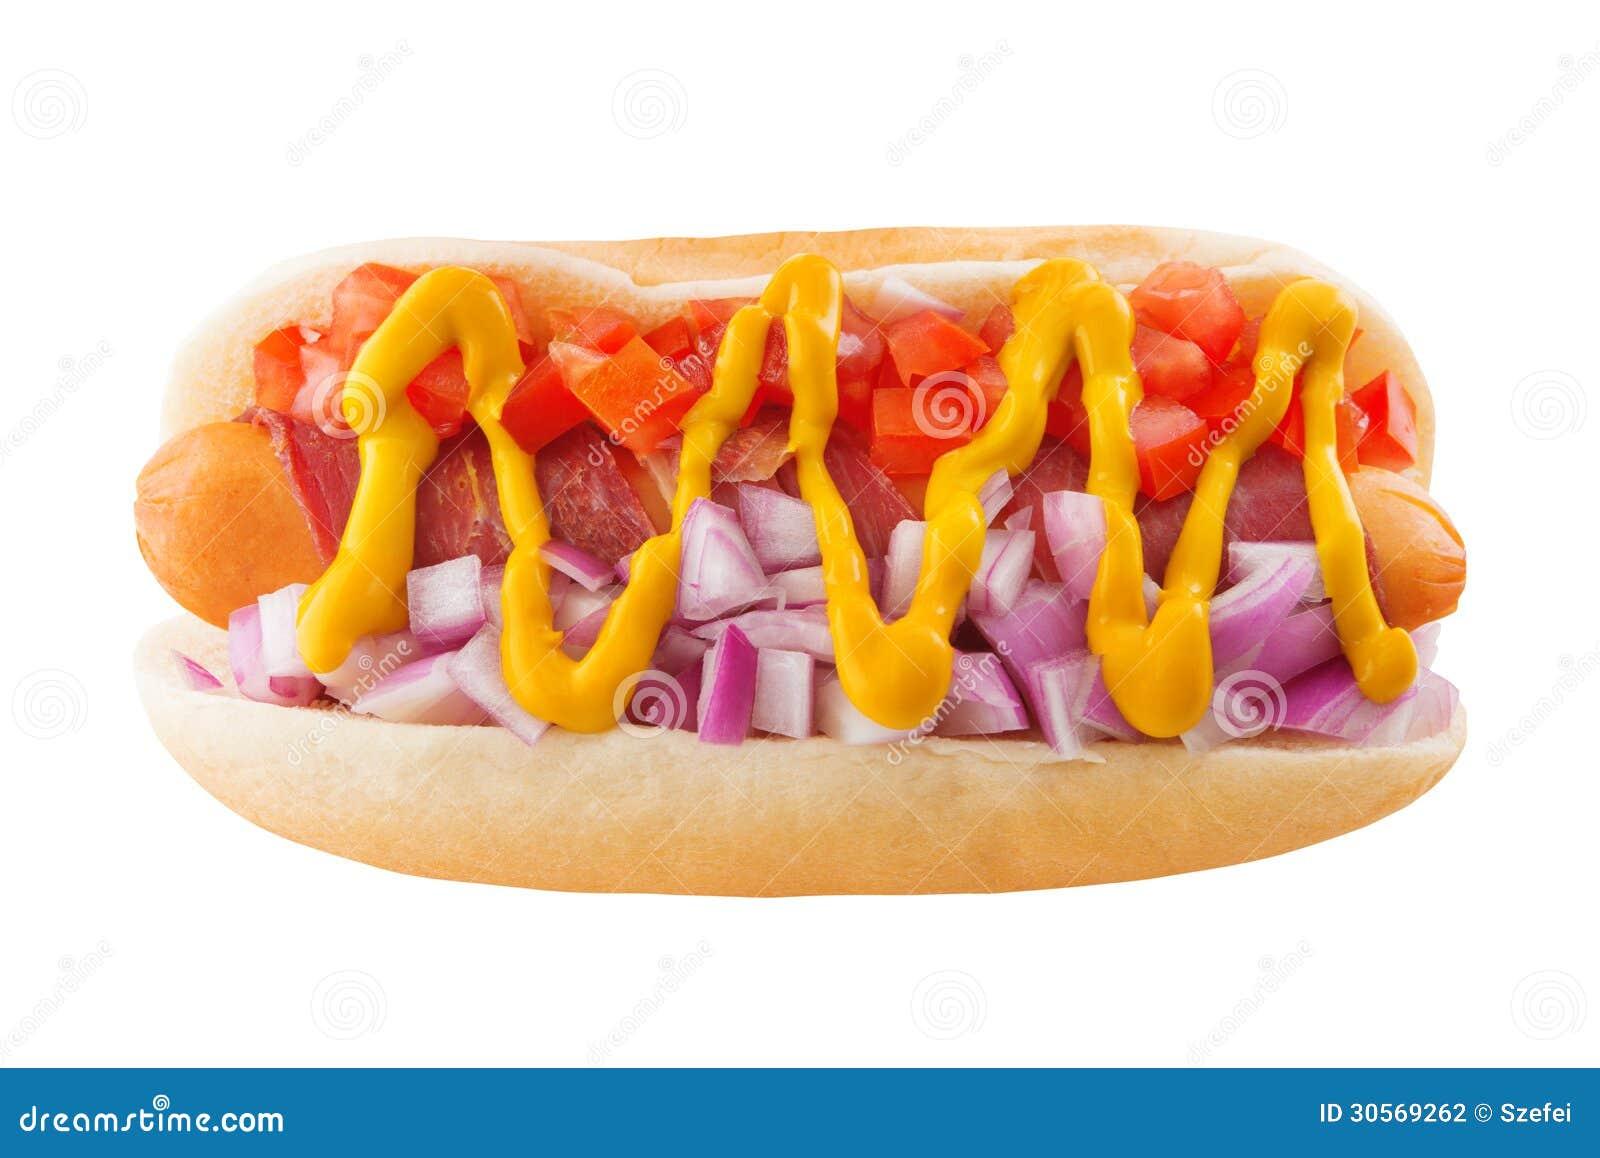 Dog Food And Onions